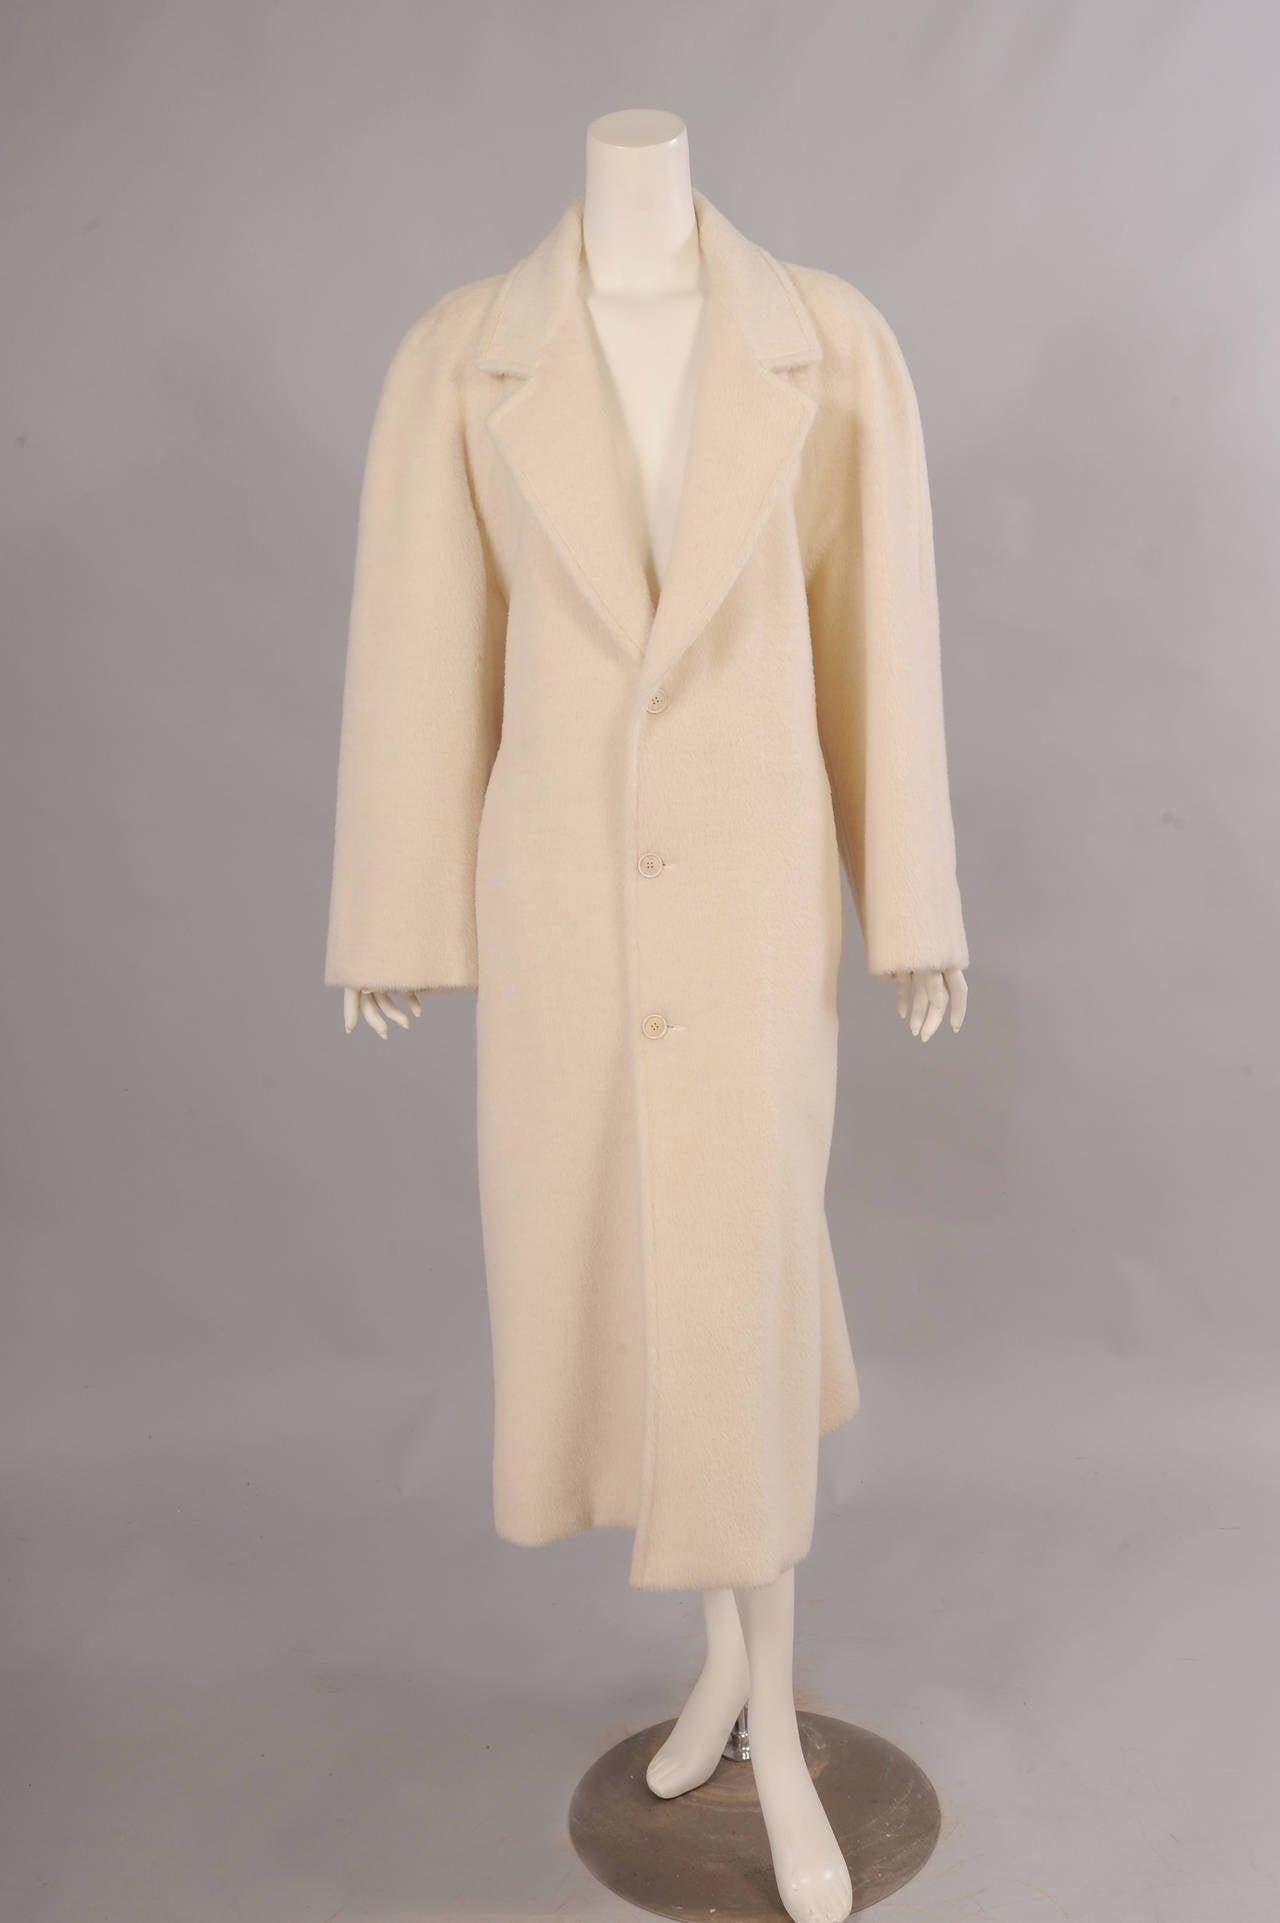 Sulka Cream Alpaca Polo Coat, Never Worn 3